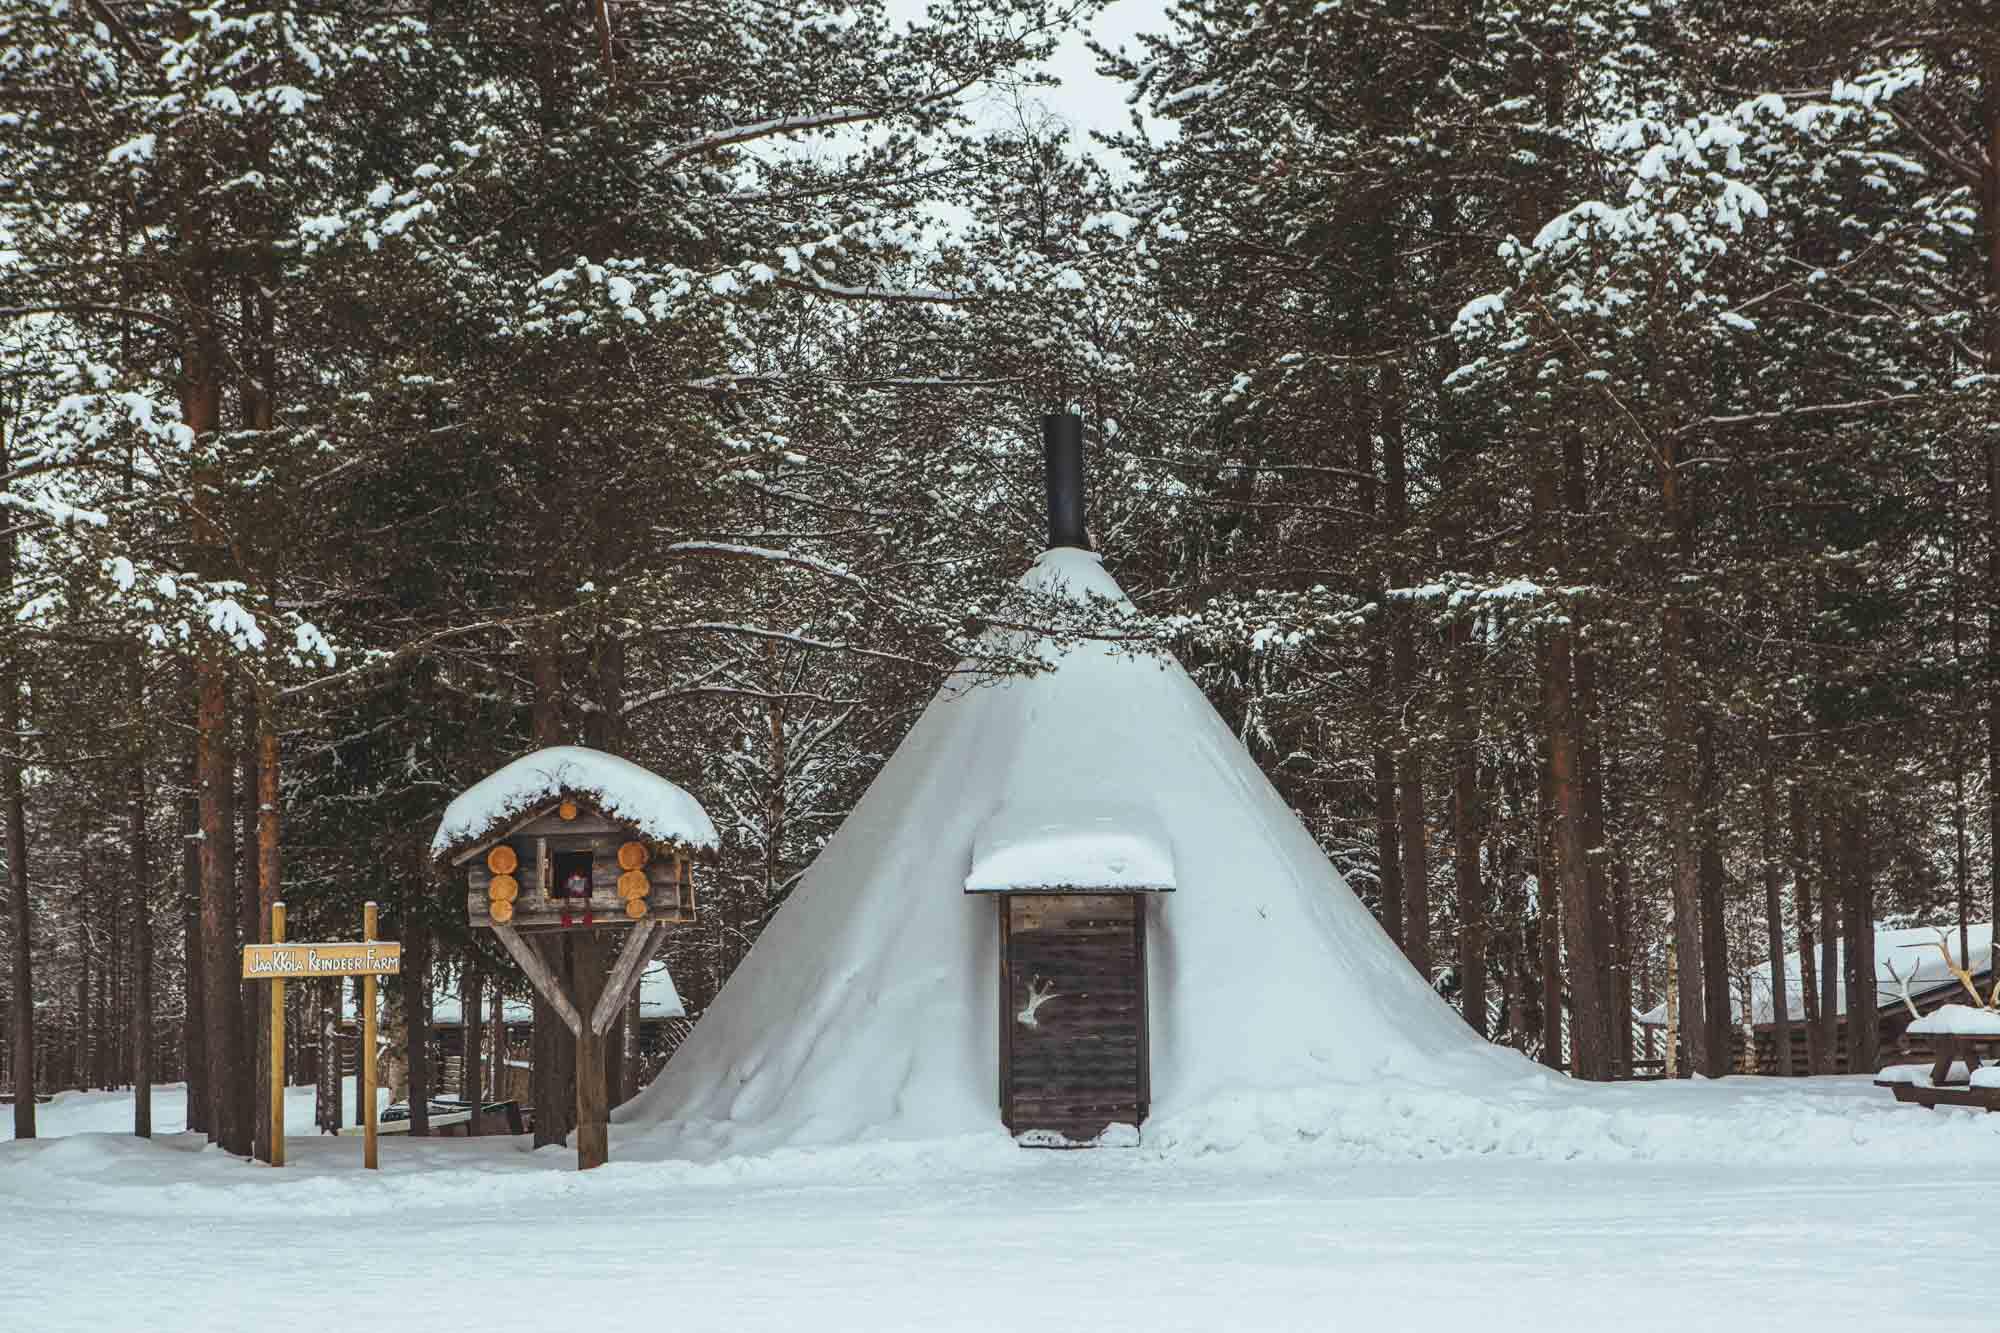 Jaakkola Reindeer Farm - 5-day Finland itinerary Northern Lights